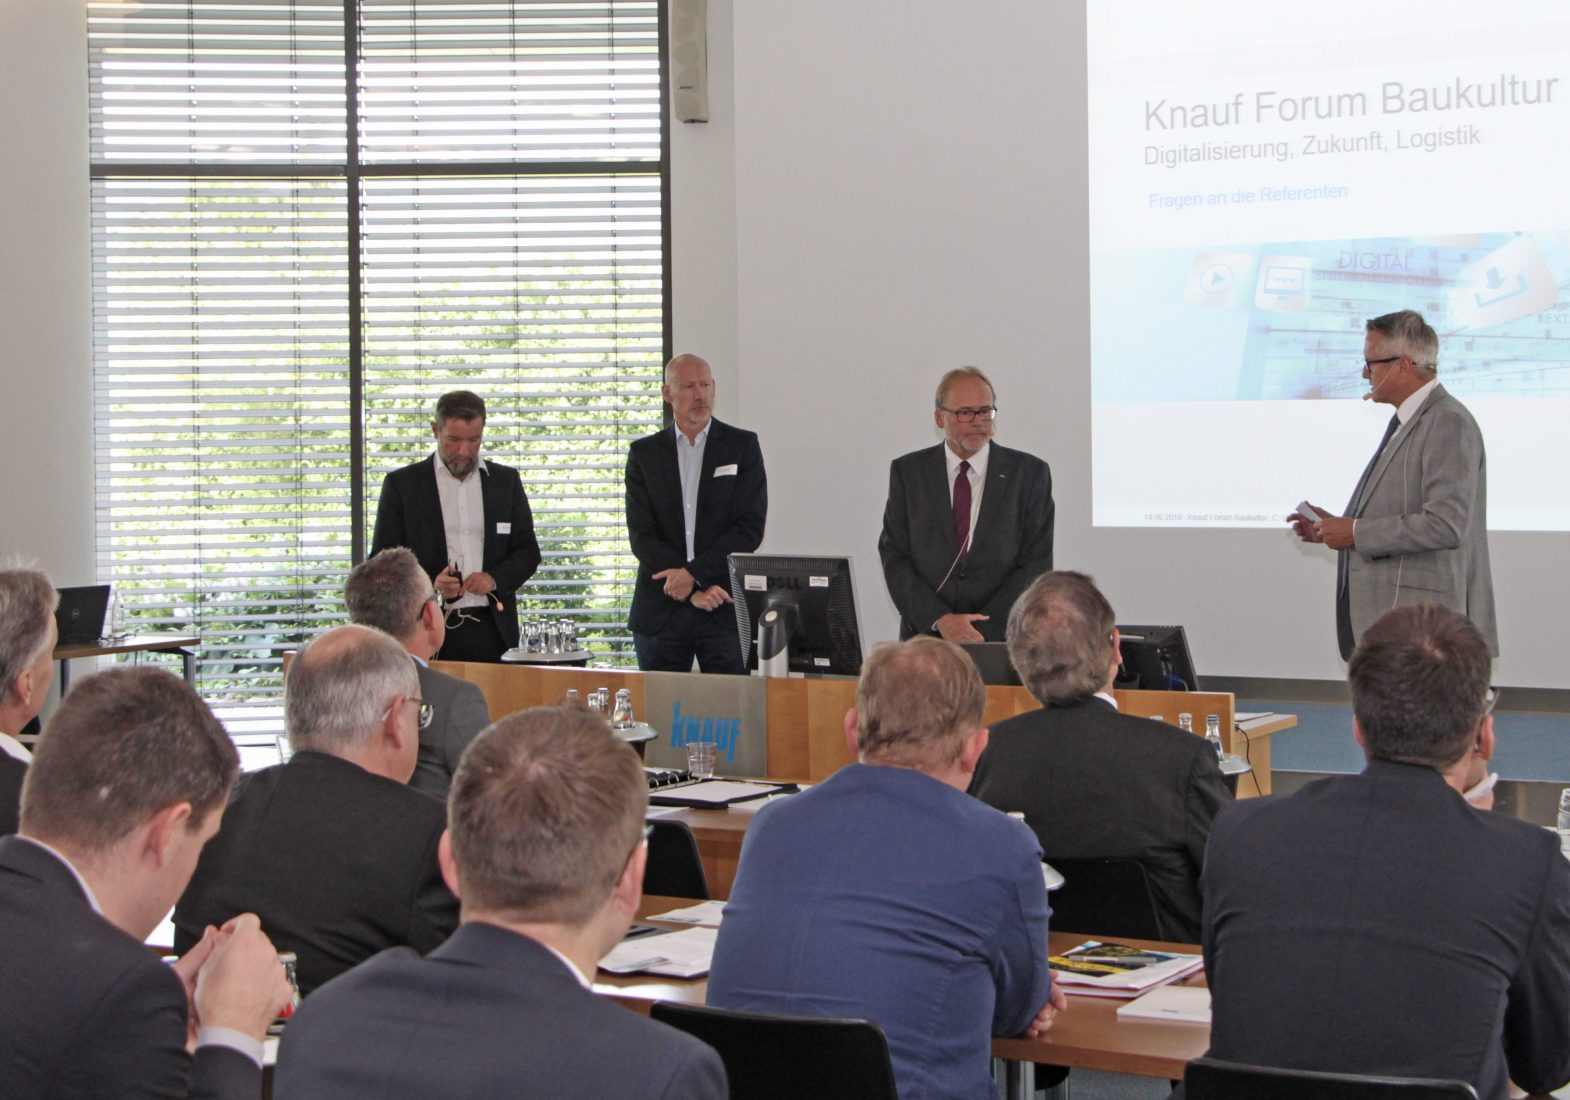 Podiumsdiskussion mit (v.l.) Dr. Alexander Rieck, Dirk Schaper, Dr. Andreas Froschmayer und Christoph Dorn. Foto: Knauf